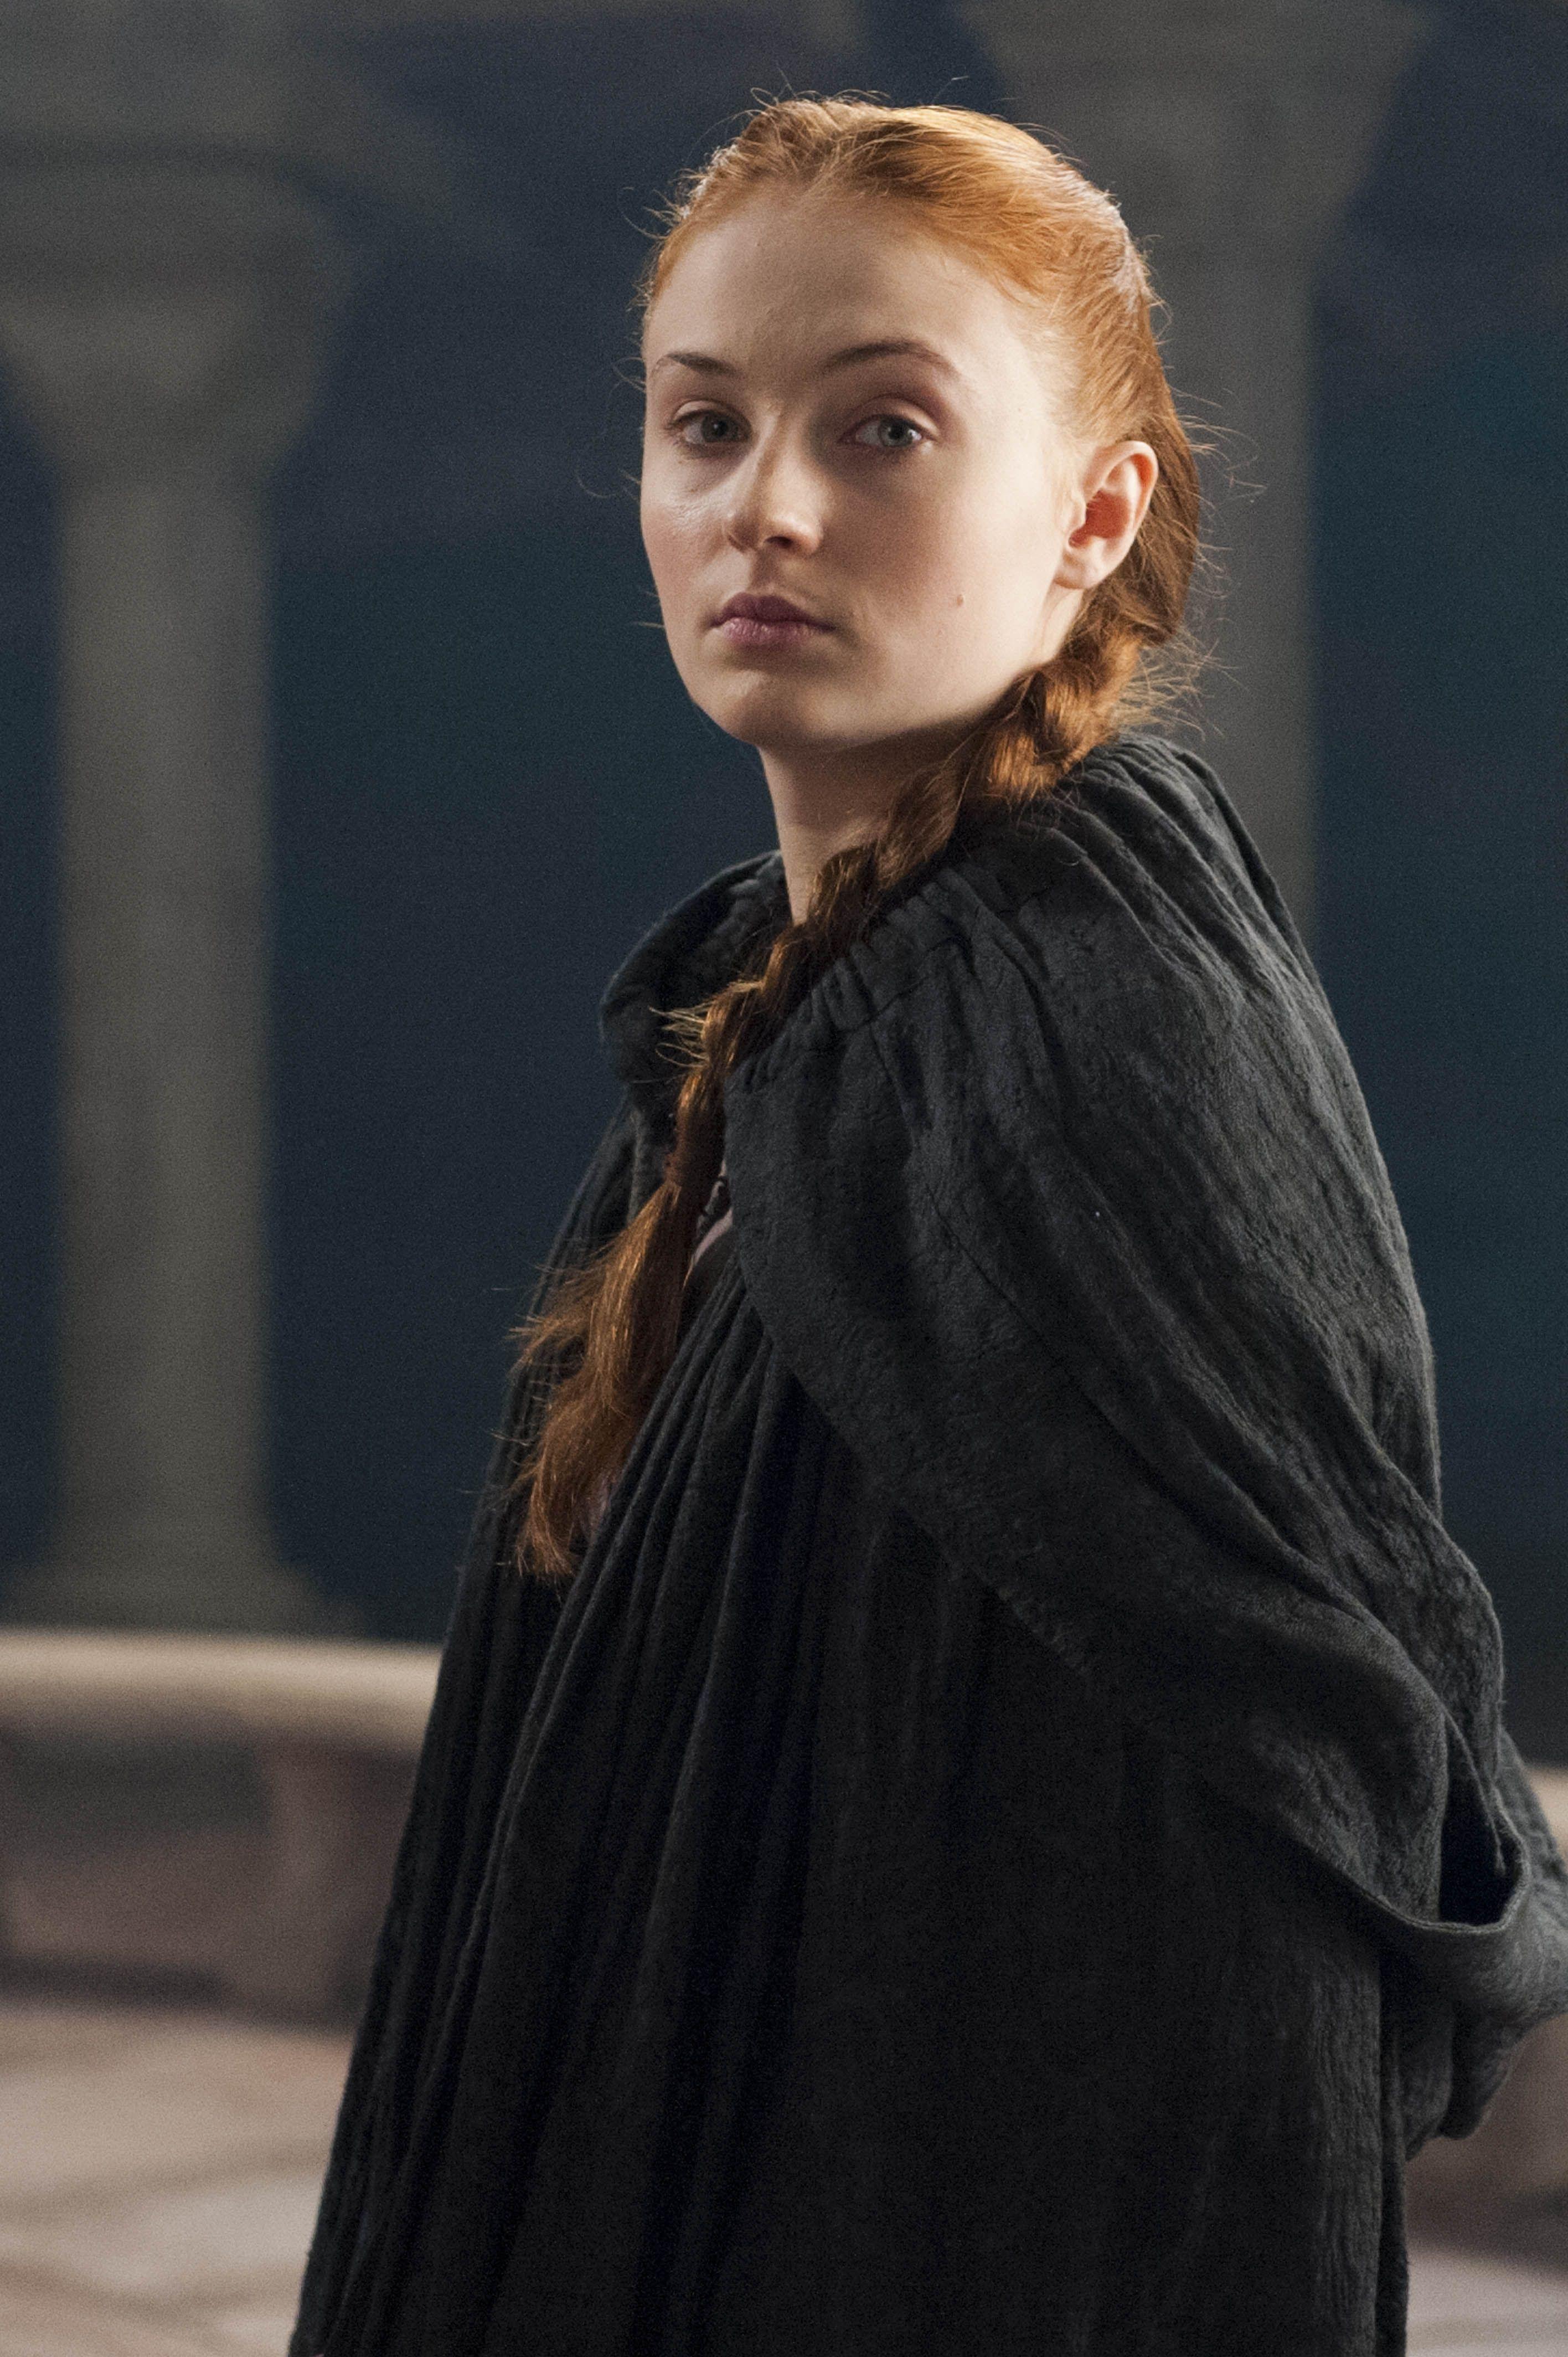 Game of Thrones Season 4 Episode 5 Still Sansa stark